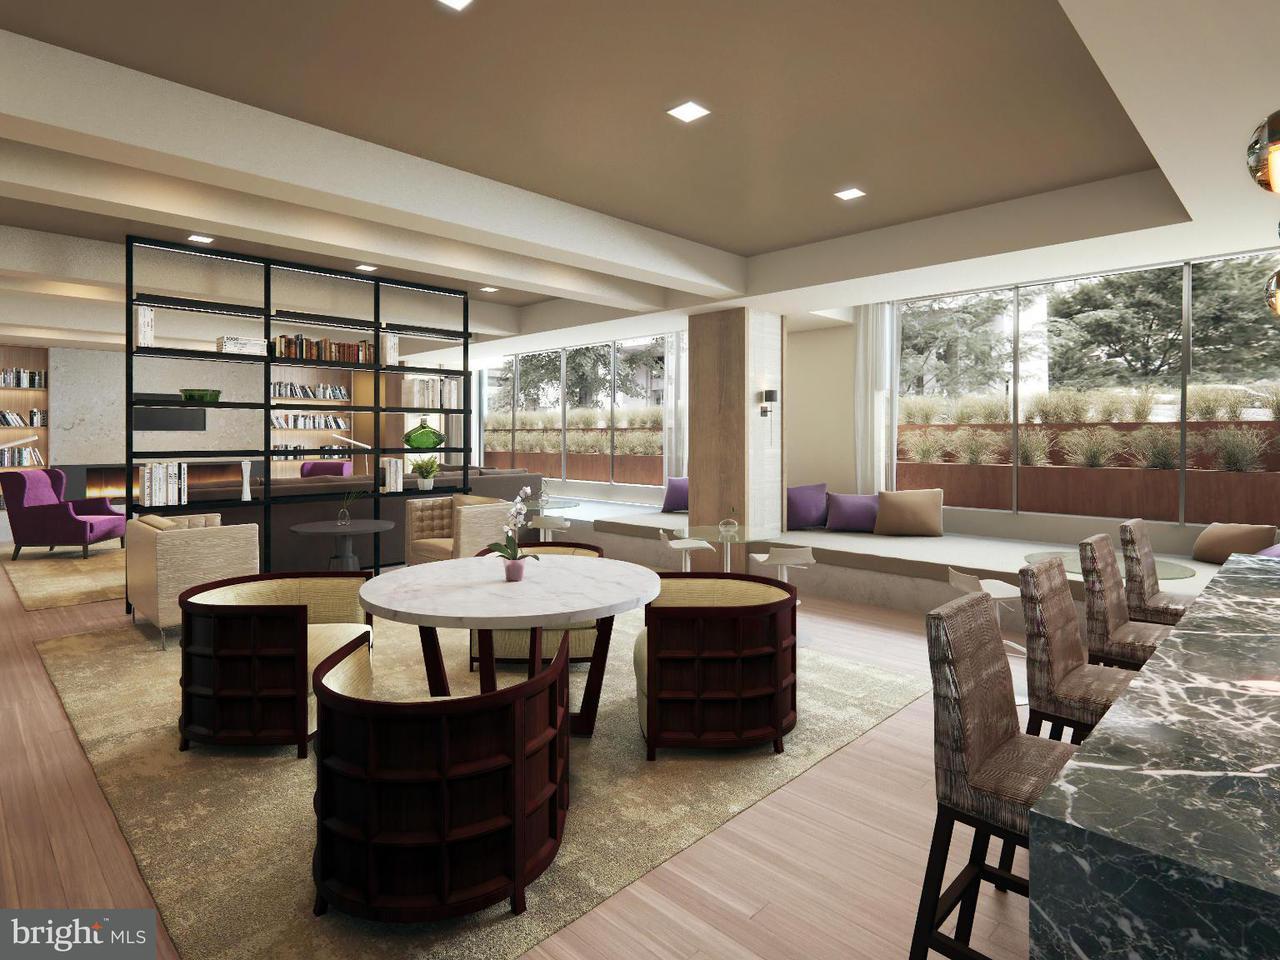 Additional photo for property listing at 2501 M ST NW #109 2501 M ST NW #109 Washington, Distrito De Columbia 20037 Estados Unidos